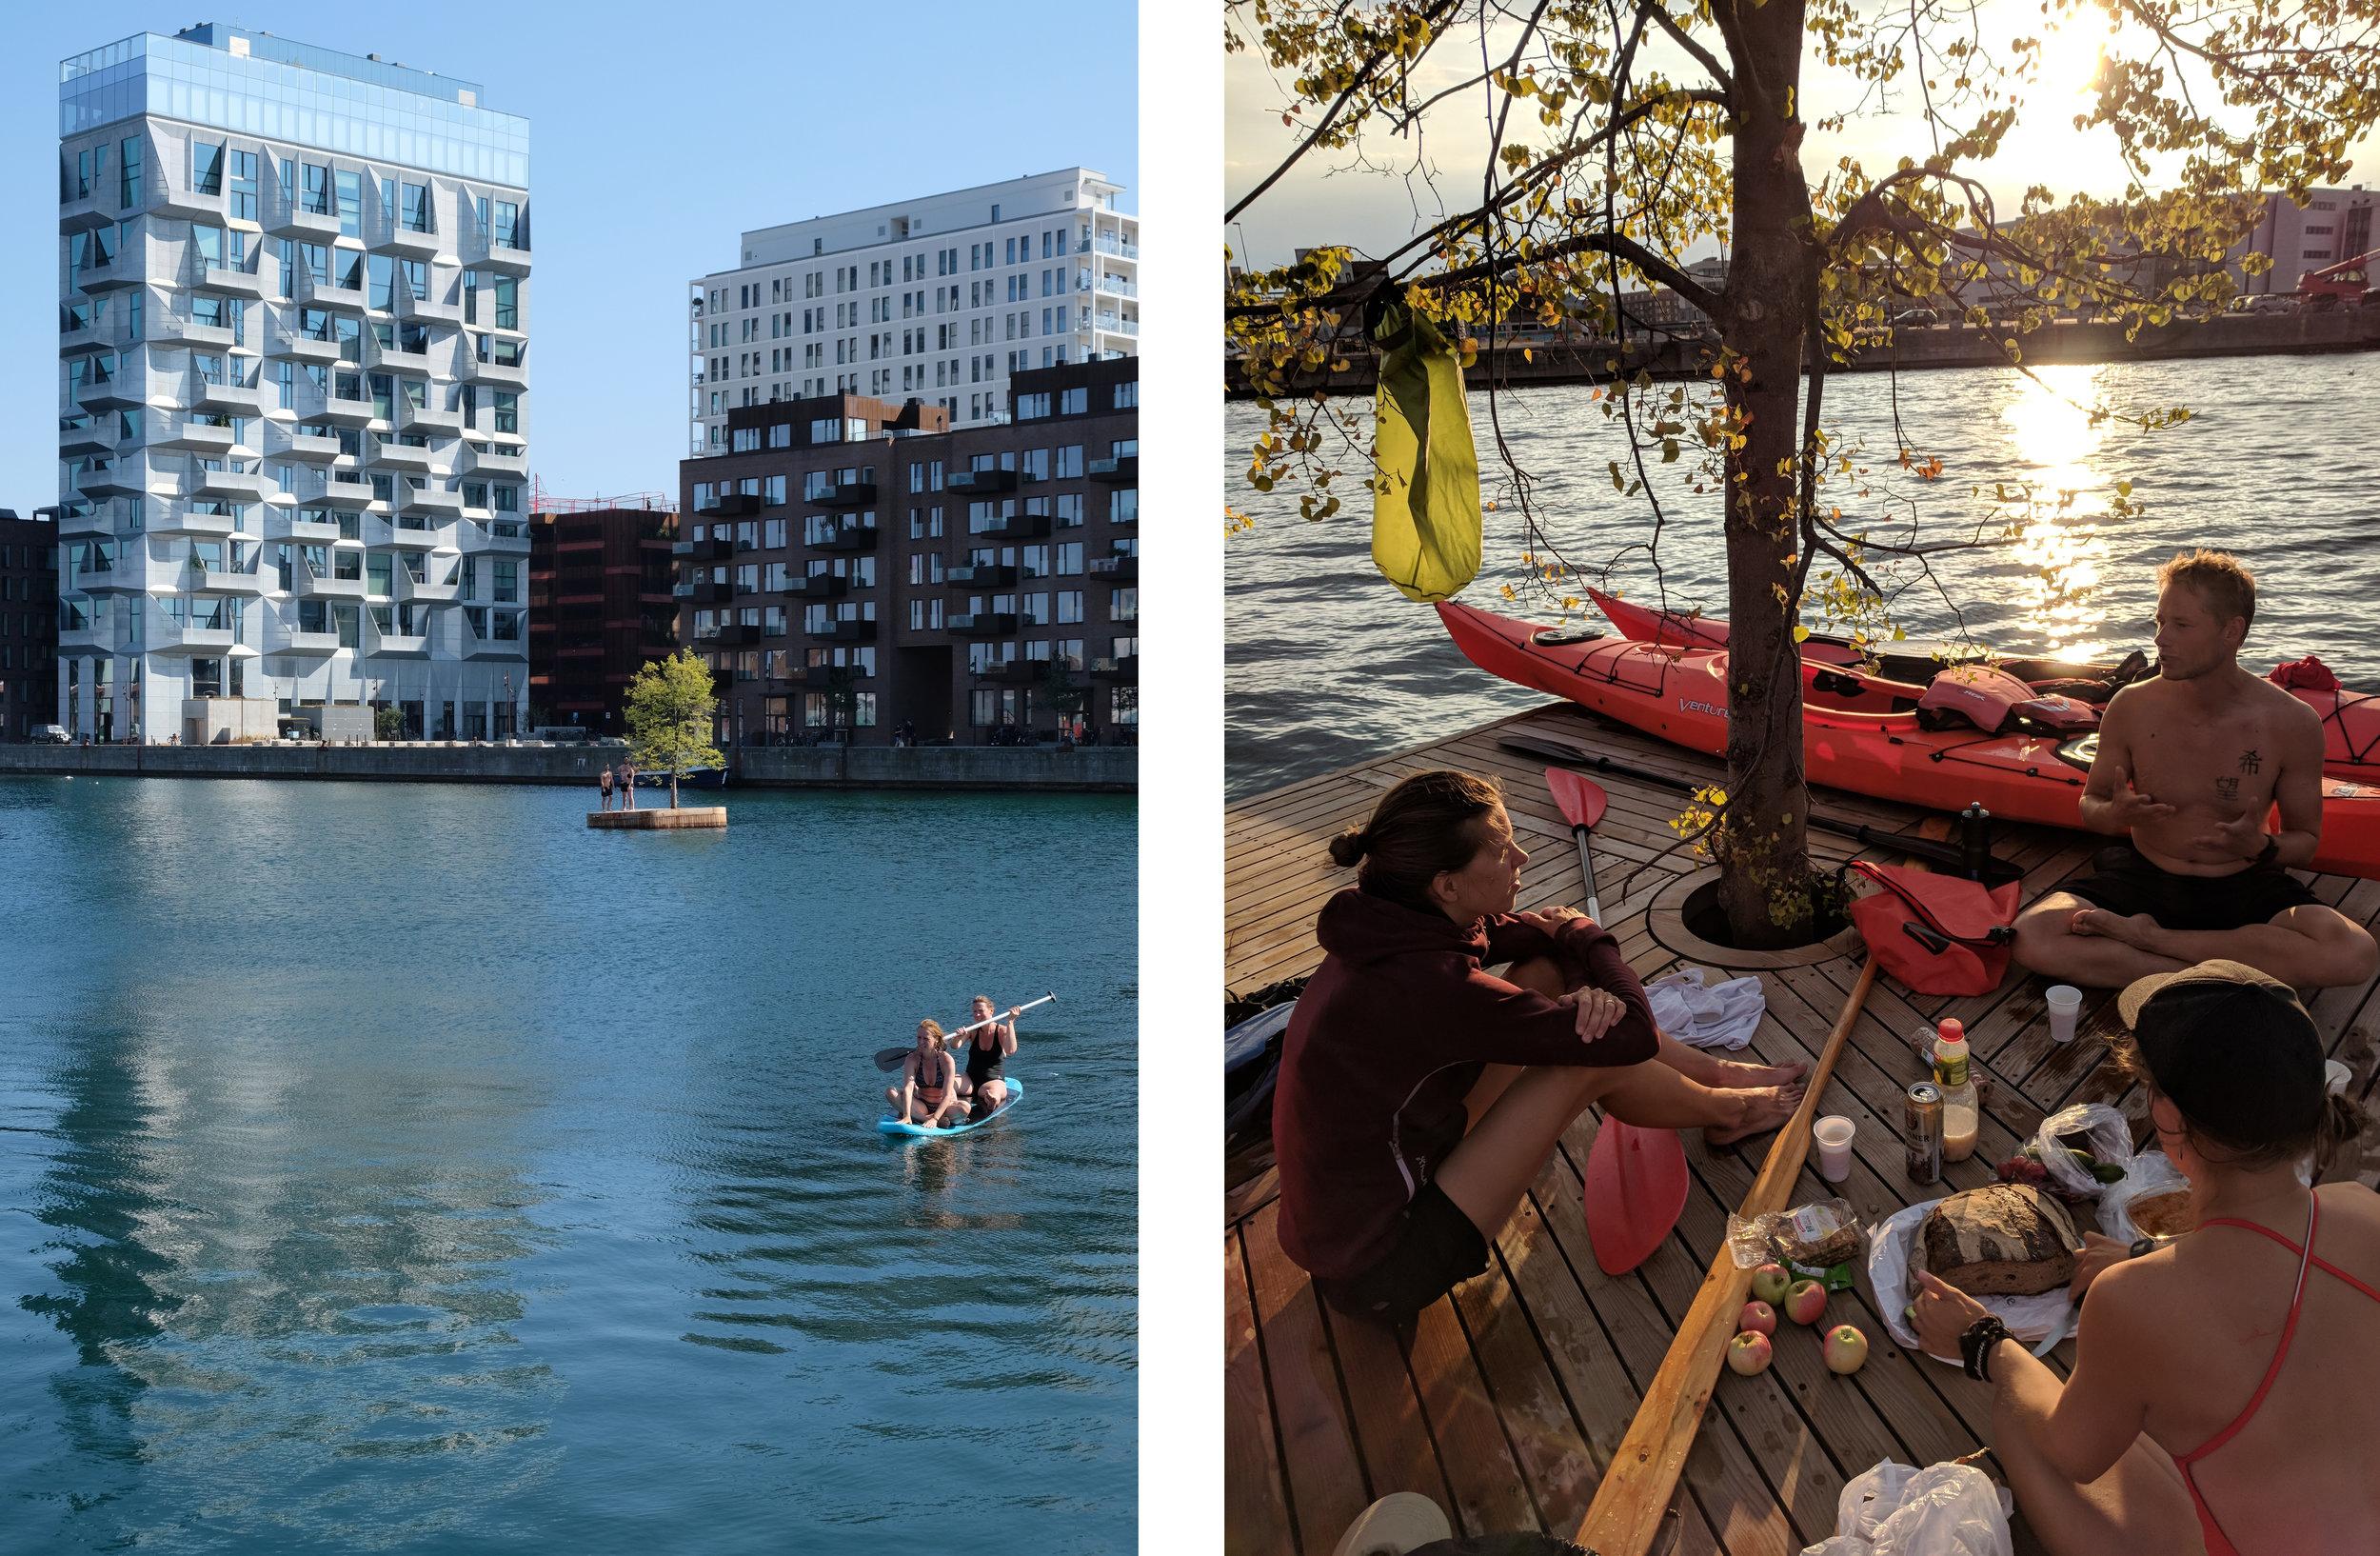 nordhavn+billeder+samlet.jpg